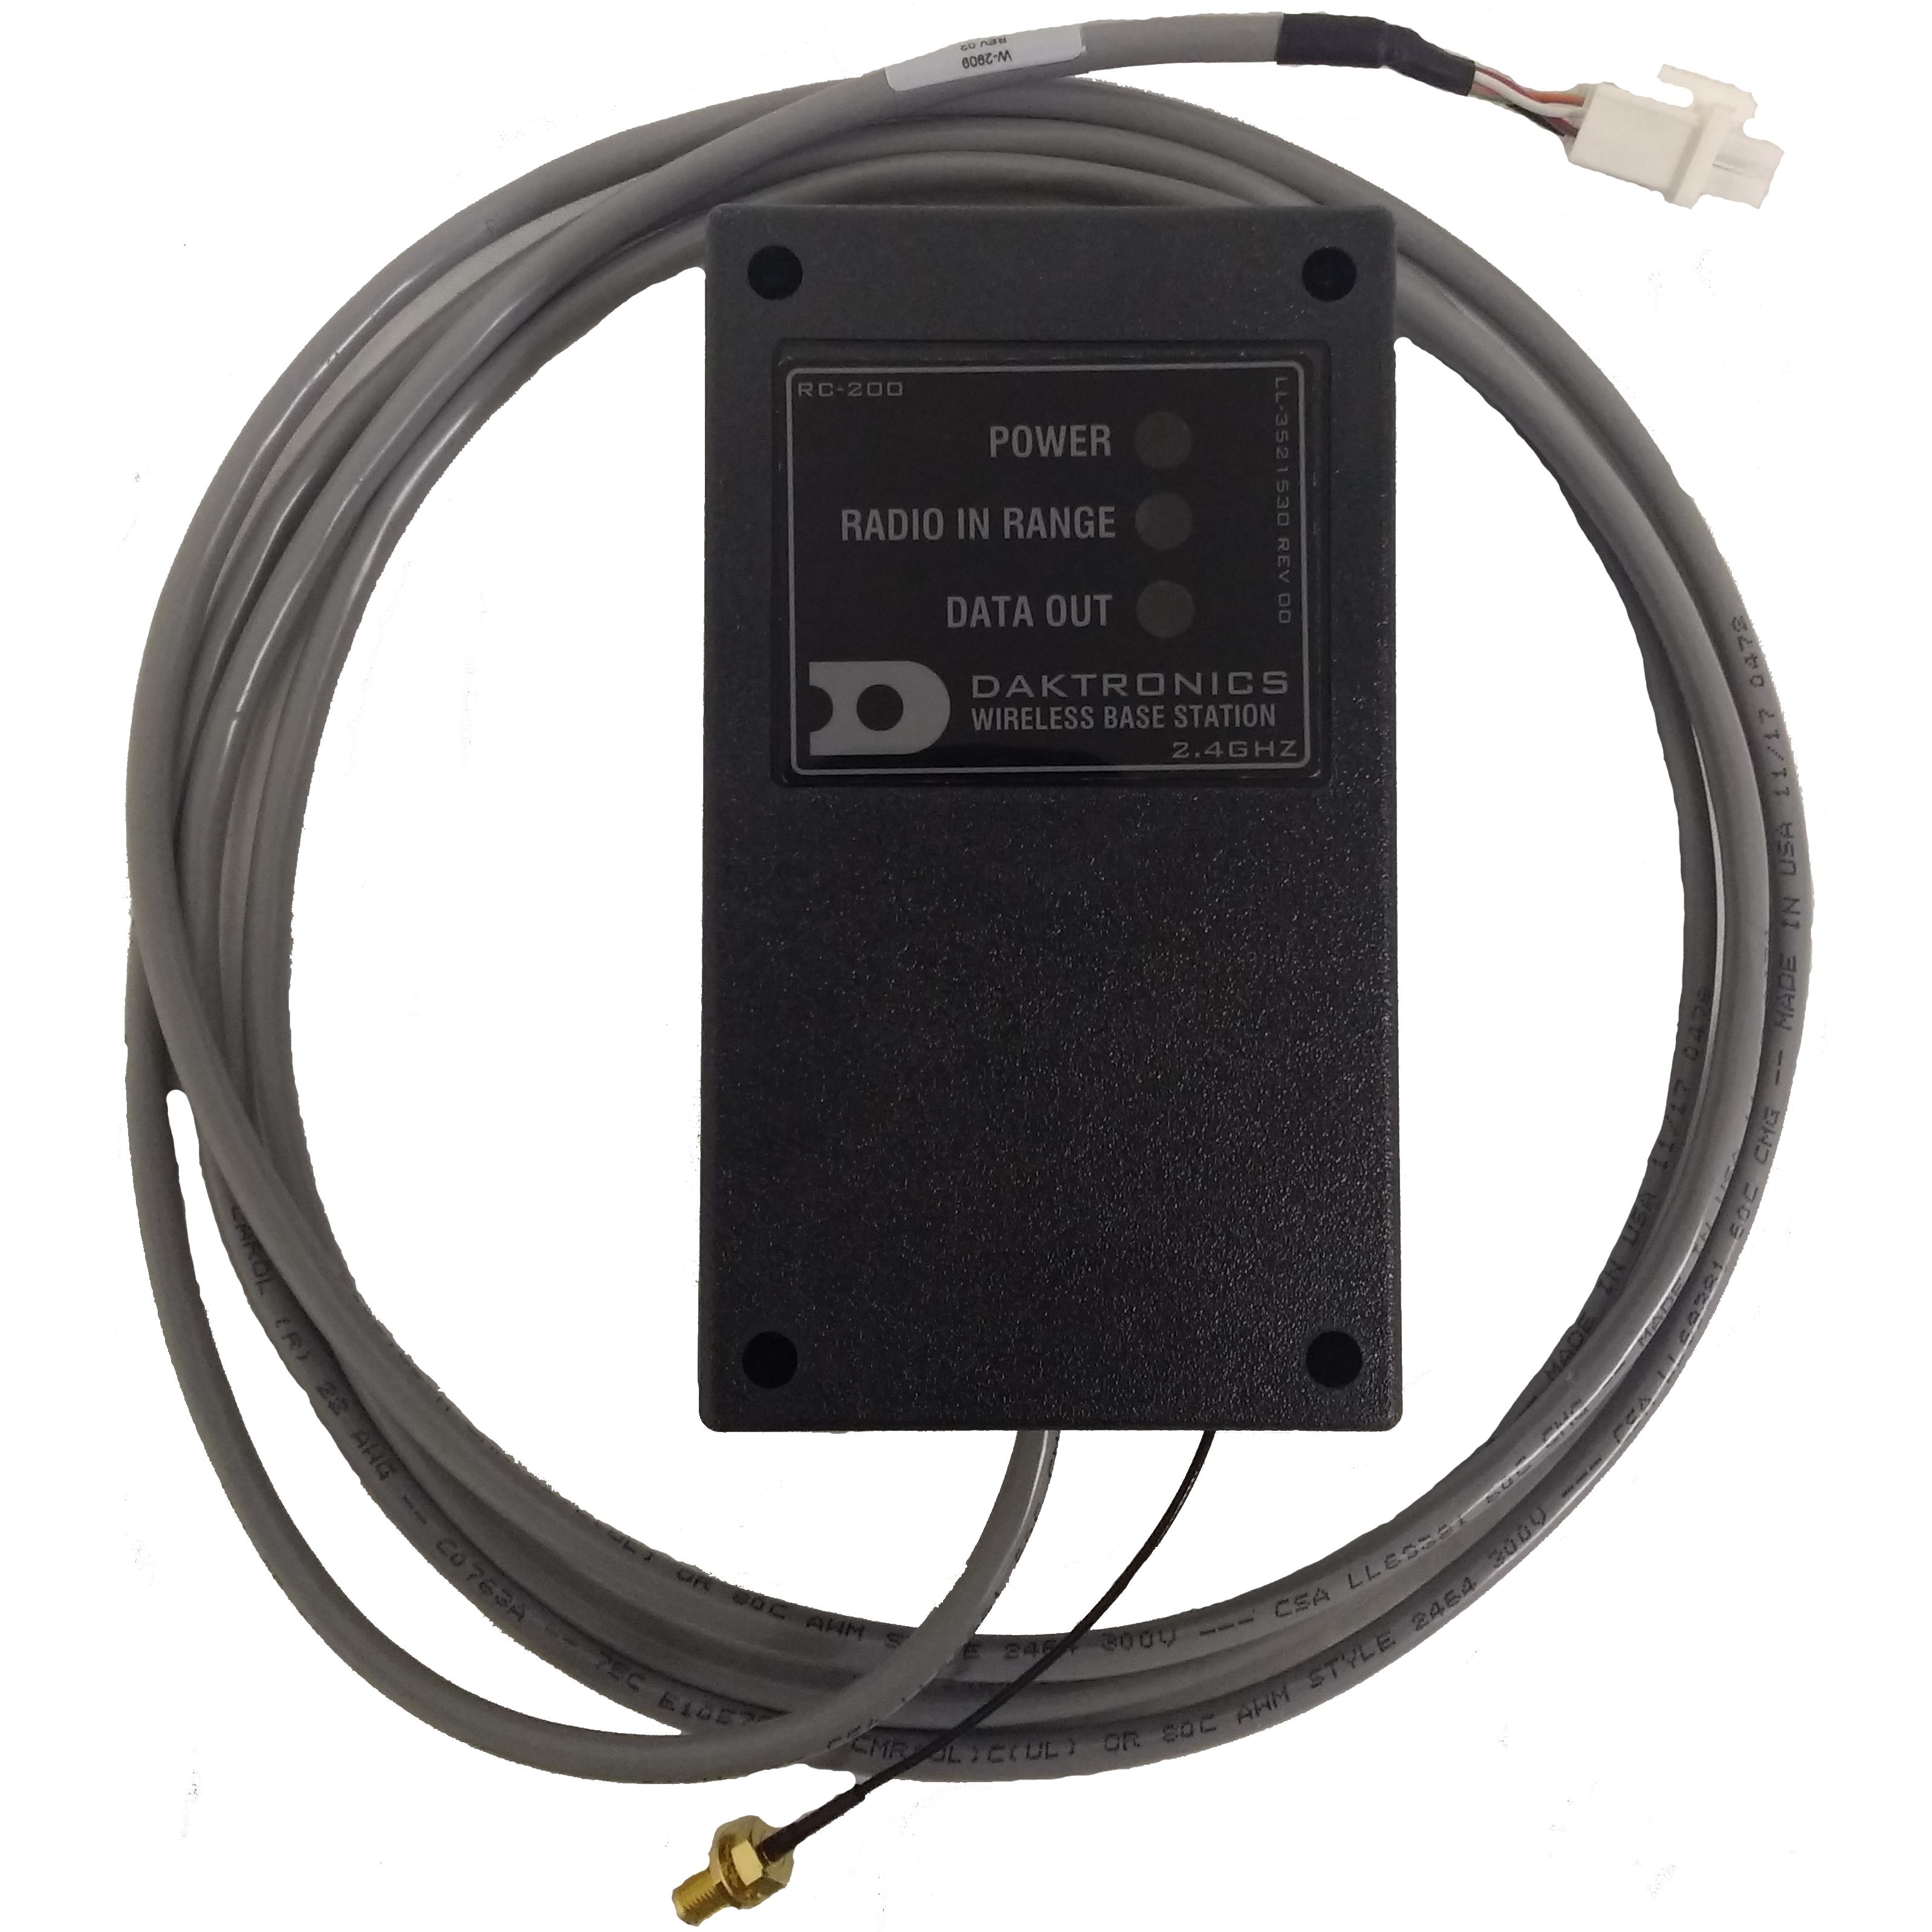 Daktronics-0A-1110-0065-RC-200-Base-Station-Receiver